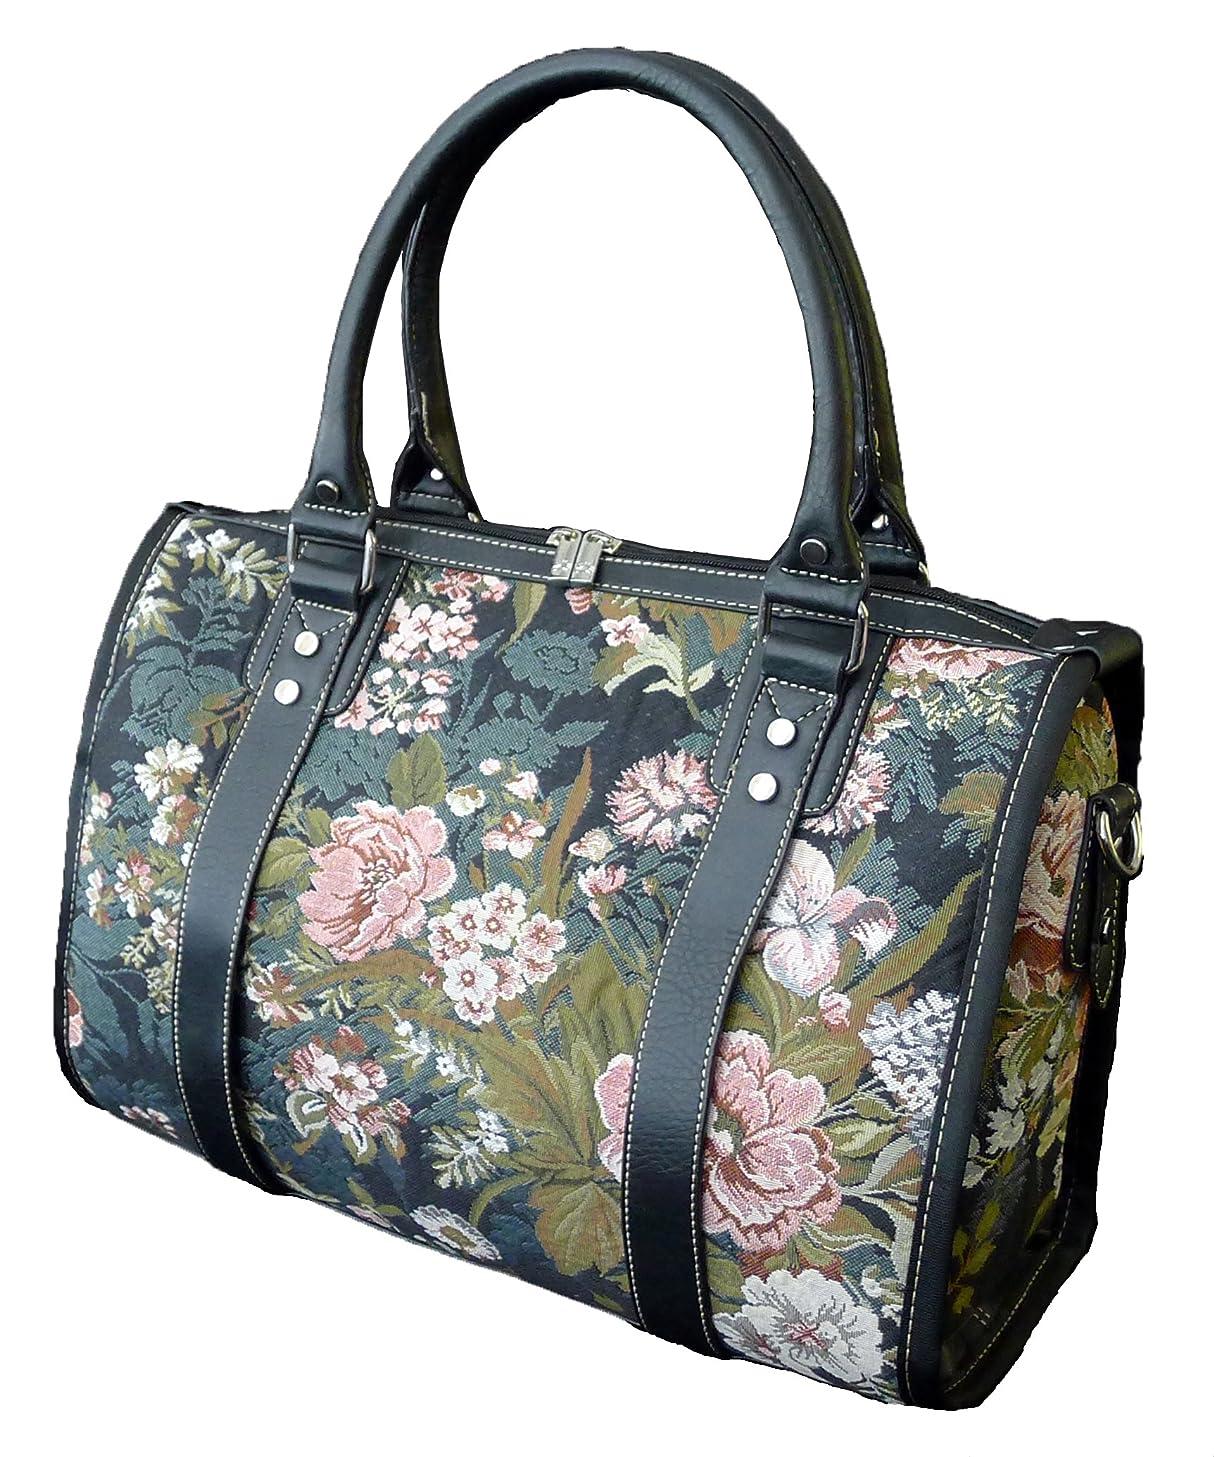 Signare 93038-Blossom Blossom Tapestry Large Purse